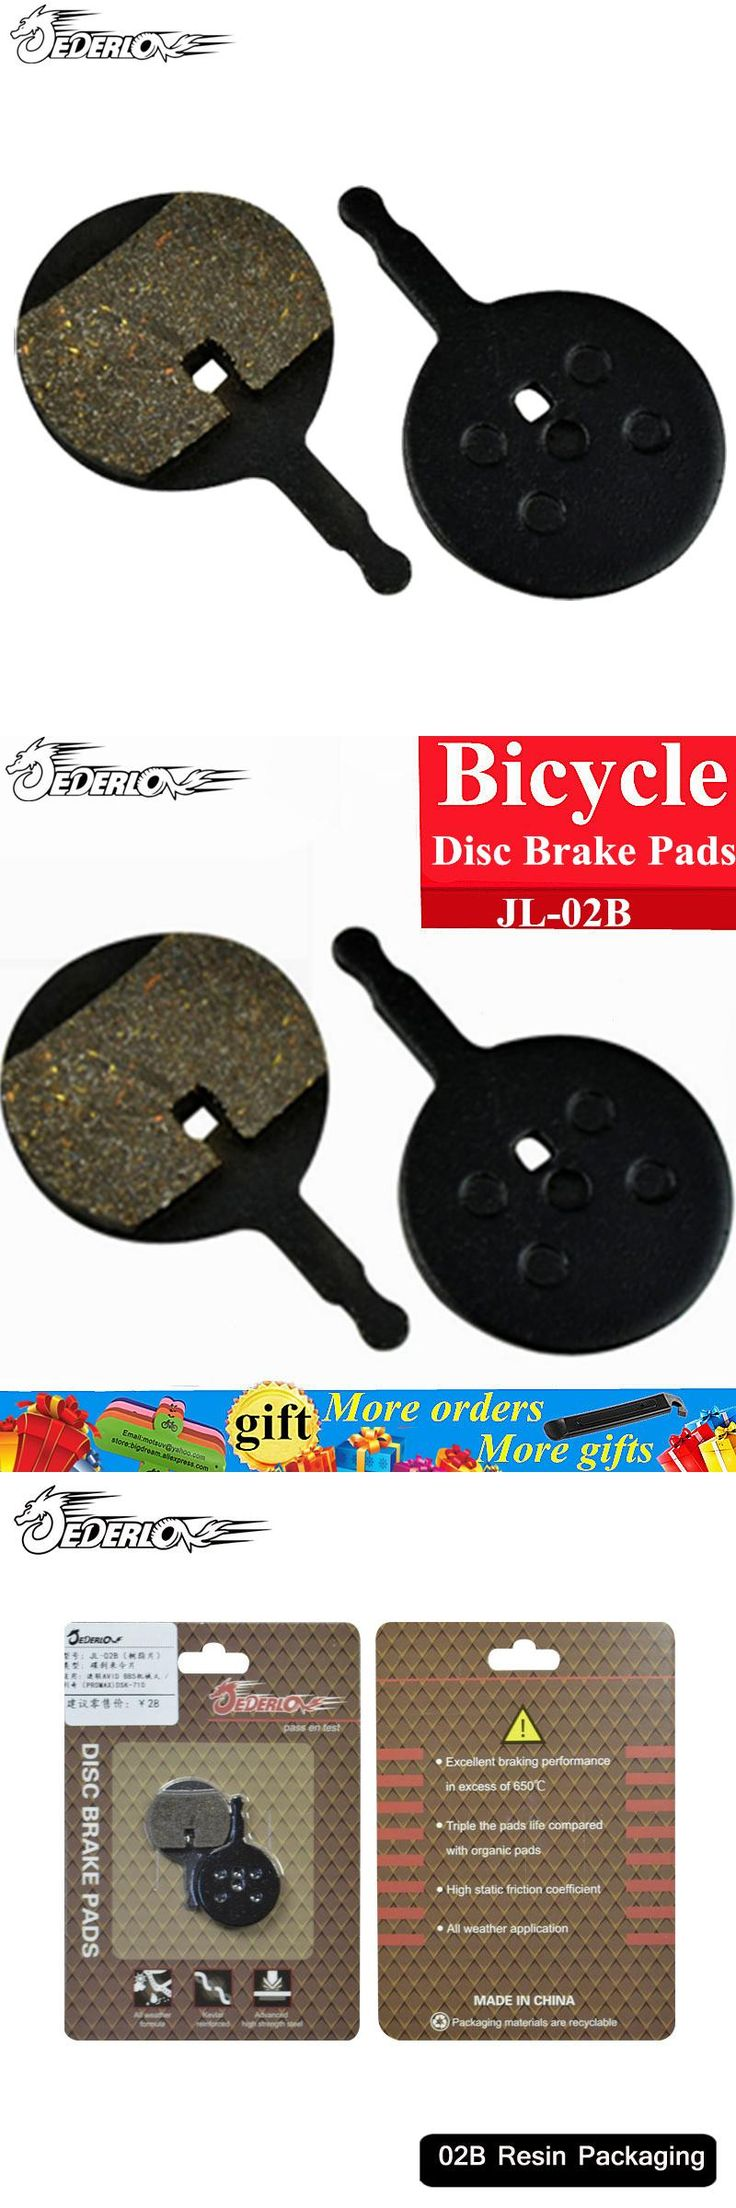 [Visit to Buy] Bicycle Disc Brake Pads for Line pulling Disc Brake AVID BB5, Giant, Merida Bike, Promax Disc Brake Resin Pads Bicycle parts #Advertisement